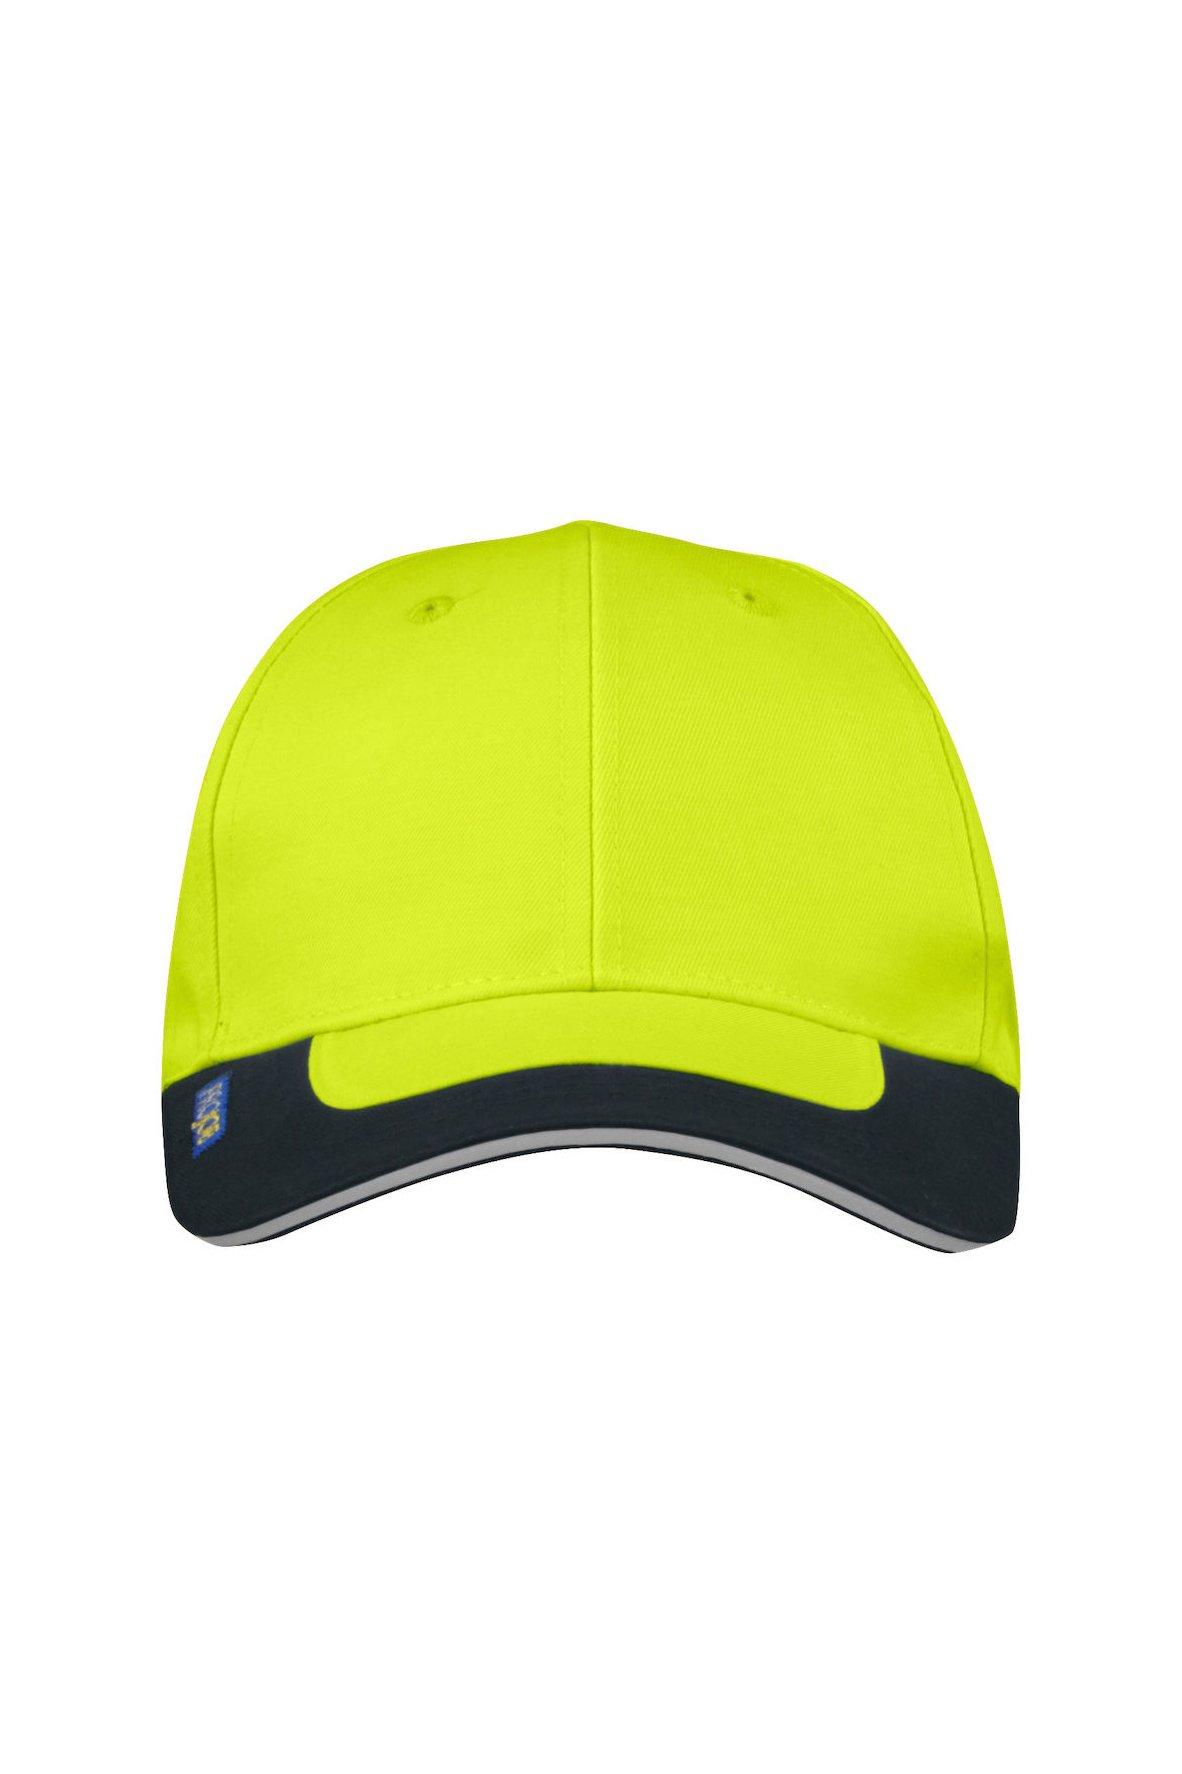 Sicherheits-Cap, gelb/marineblau